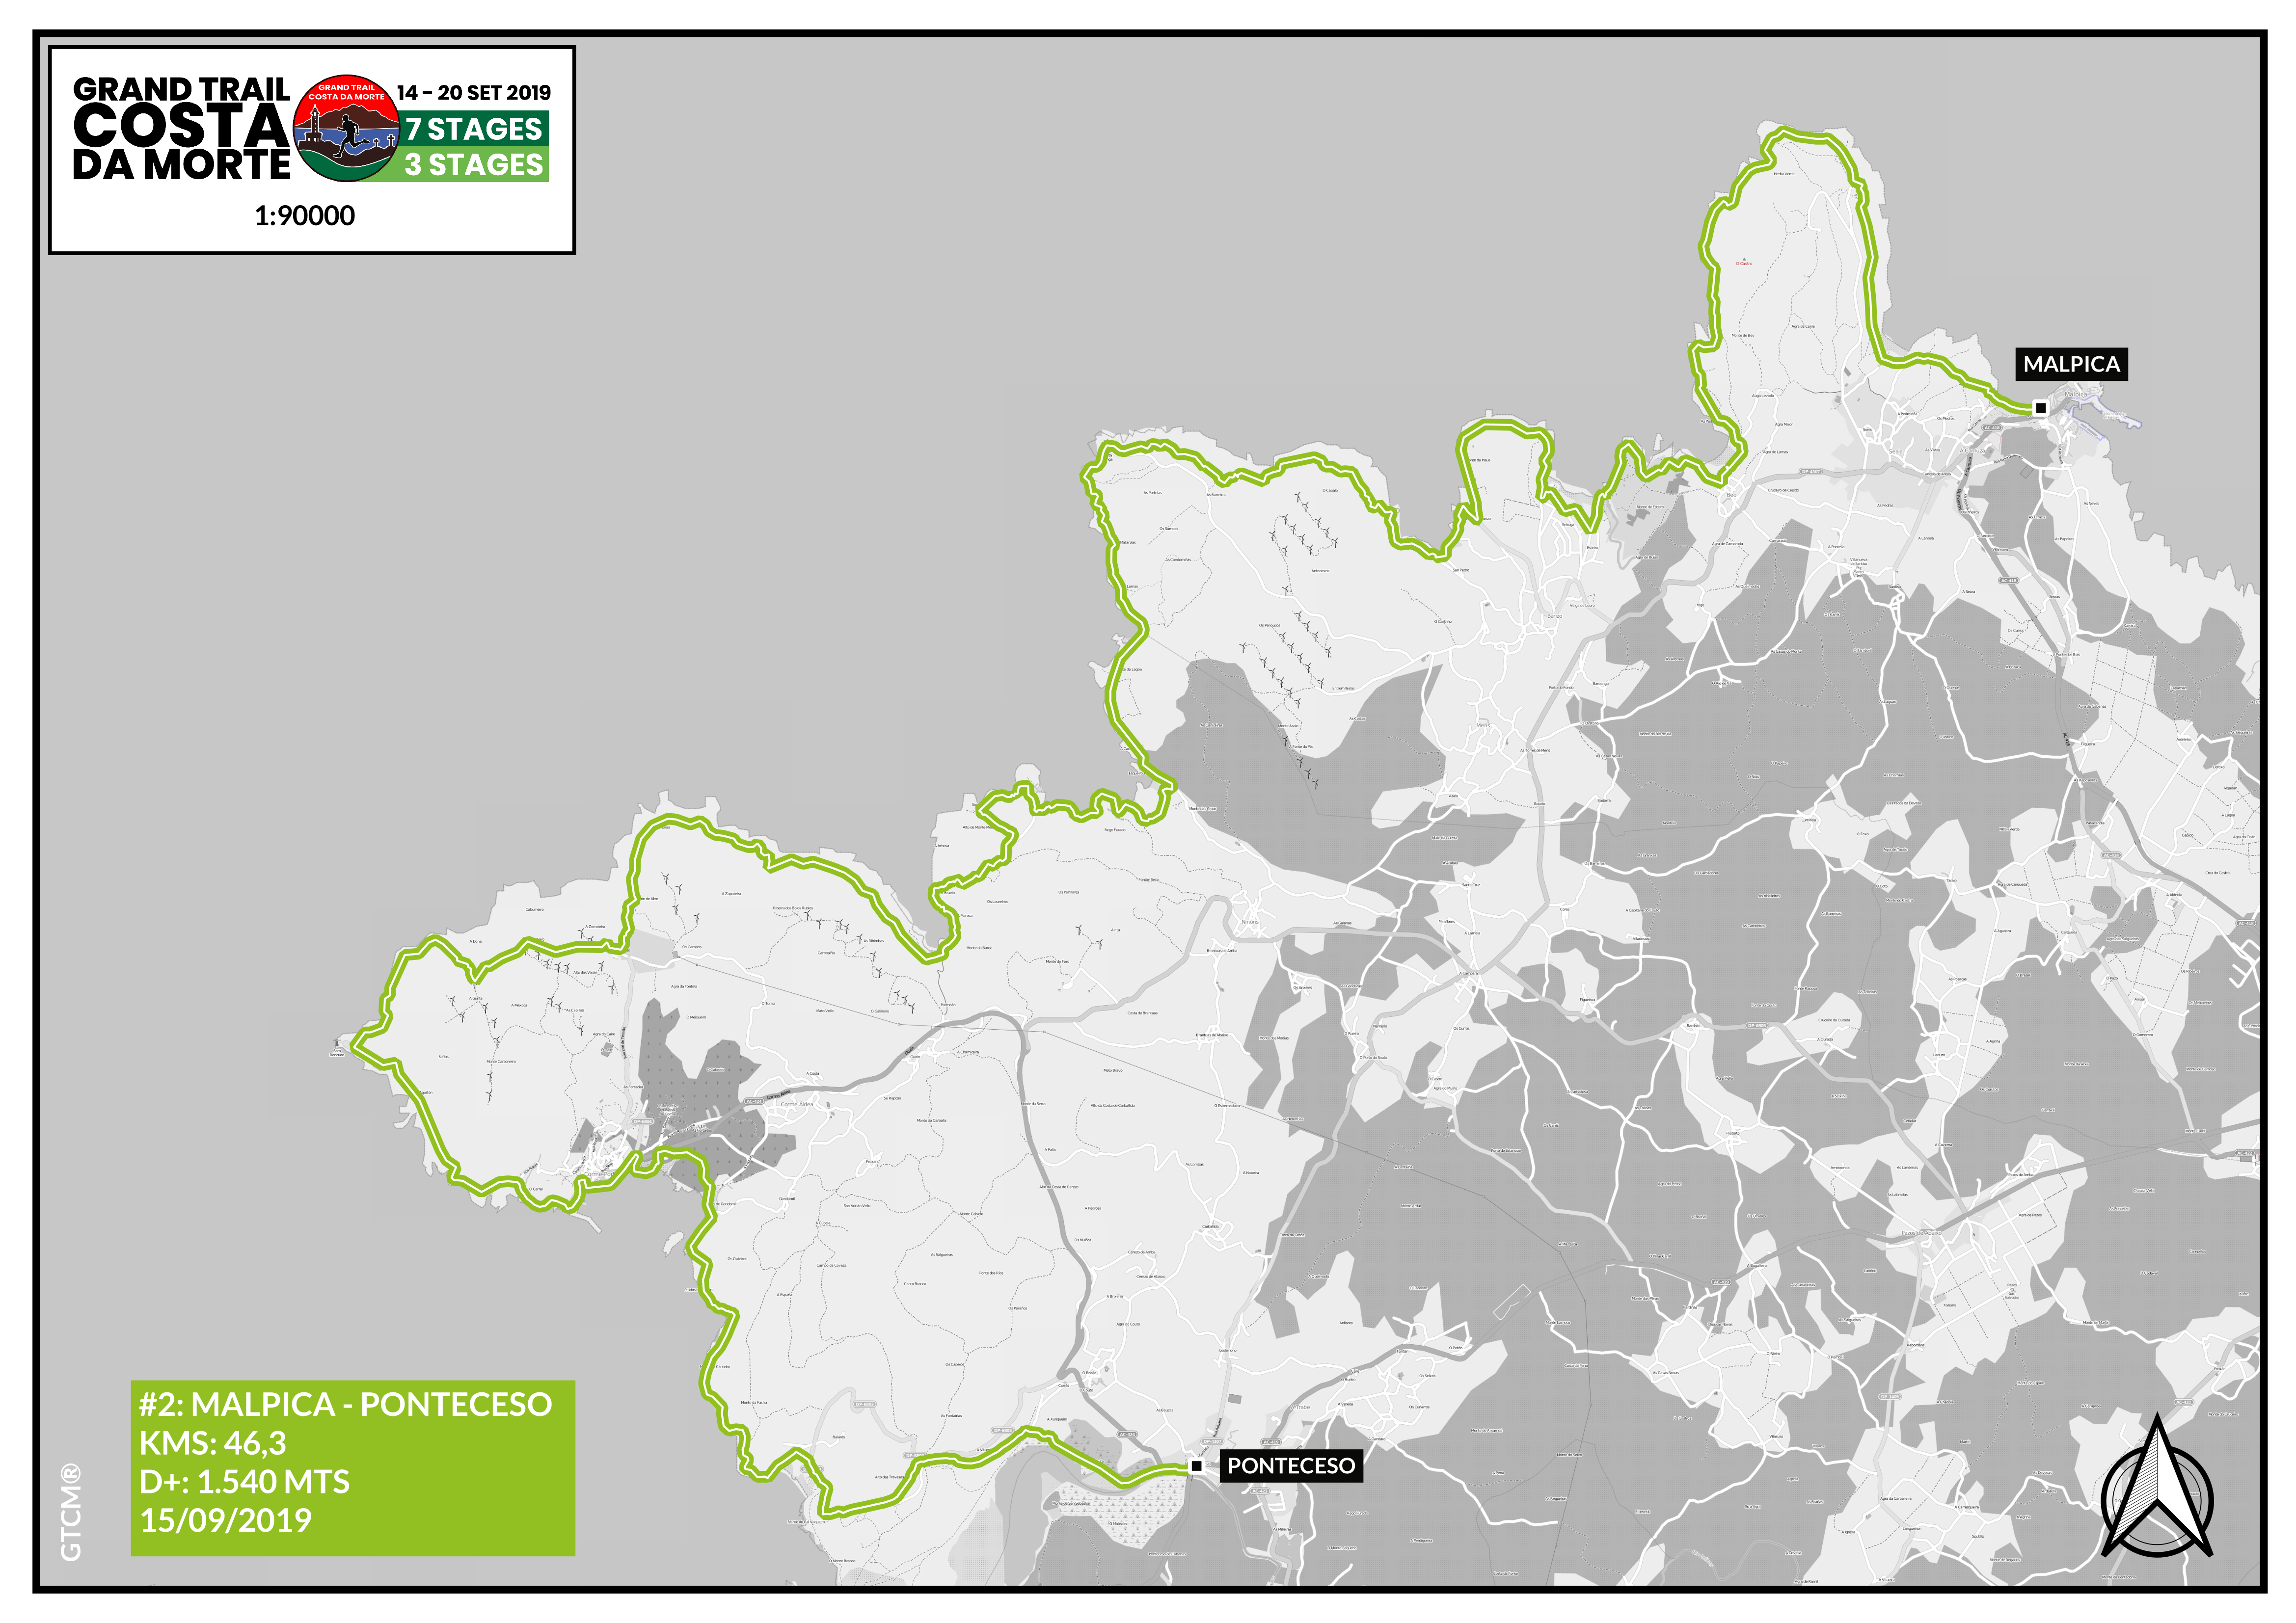 Mapa etapa 2 Malpica - Ponteceso